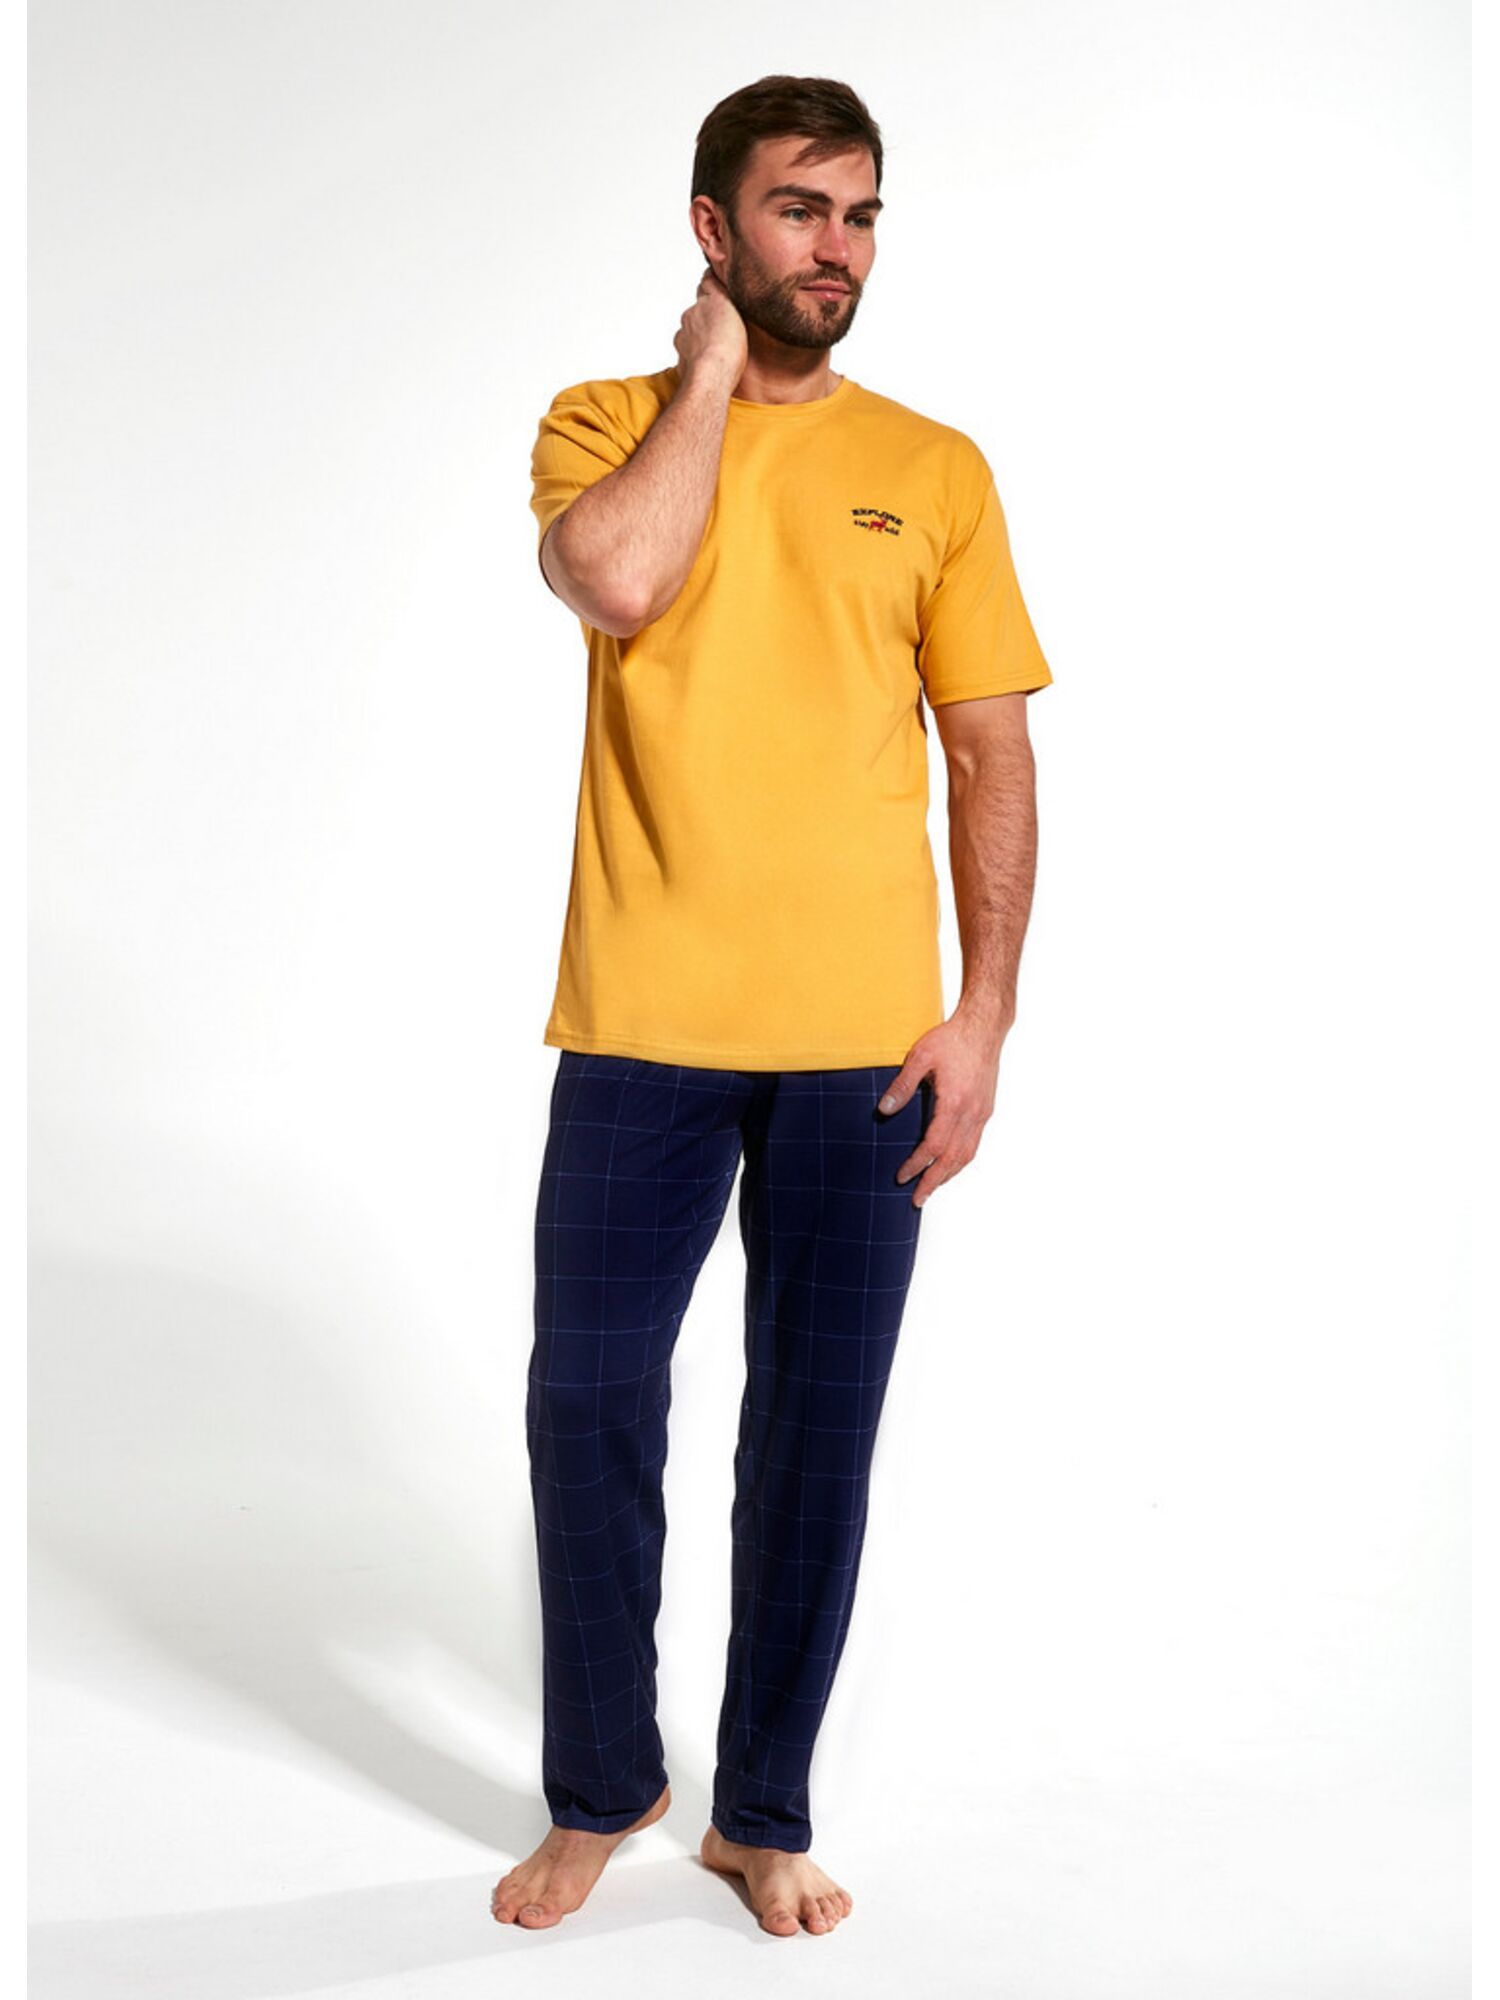 Пижама мужская со штанами хлопковая 134 EXPLORE, желтый, CORNETTE